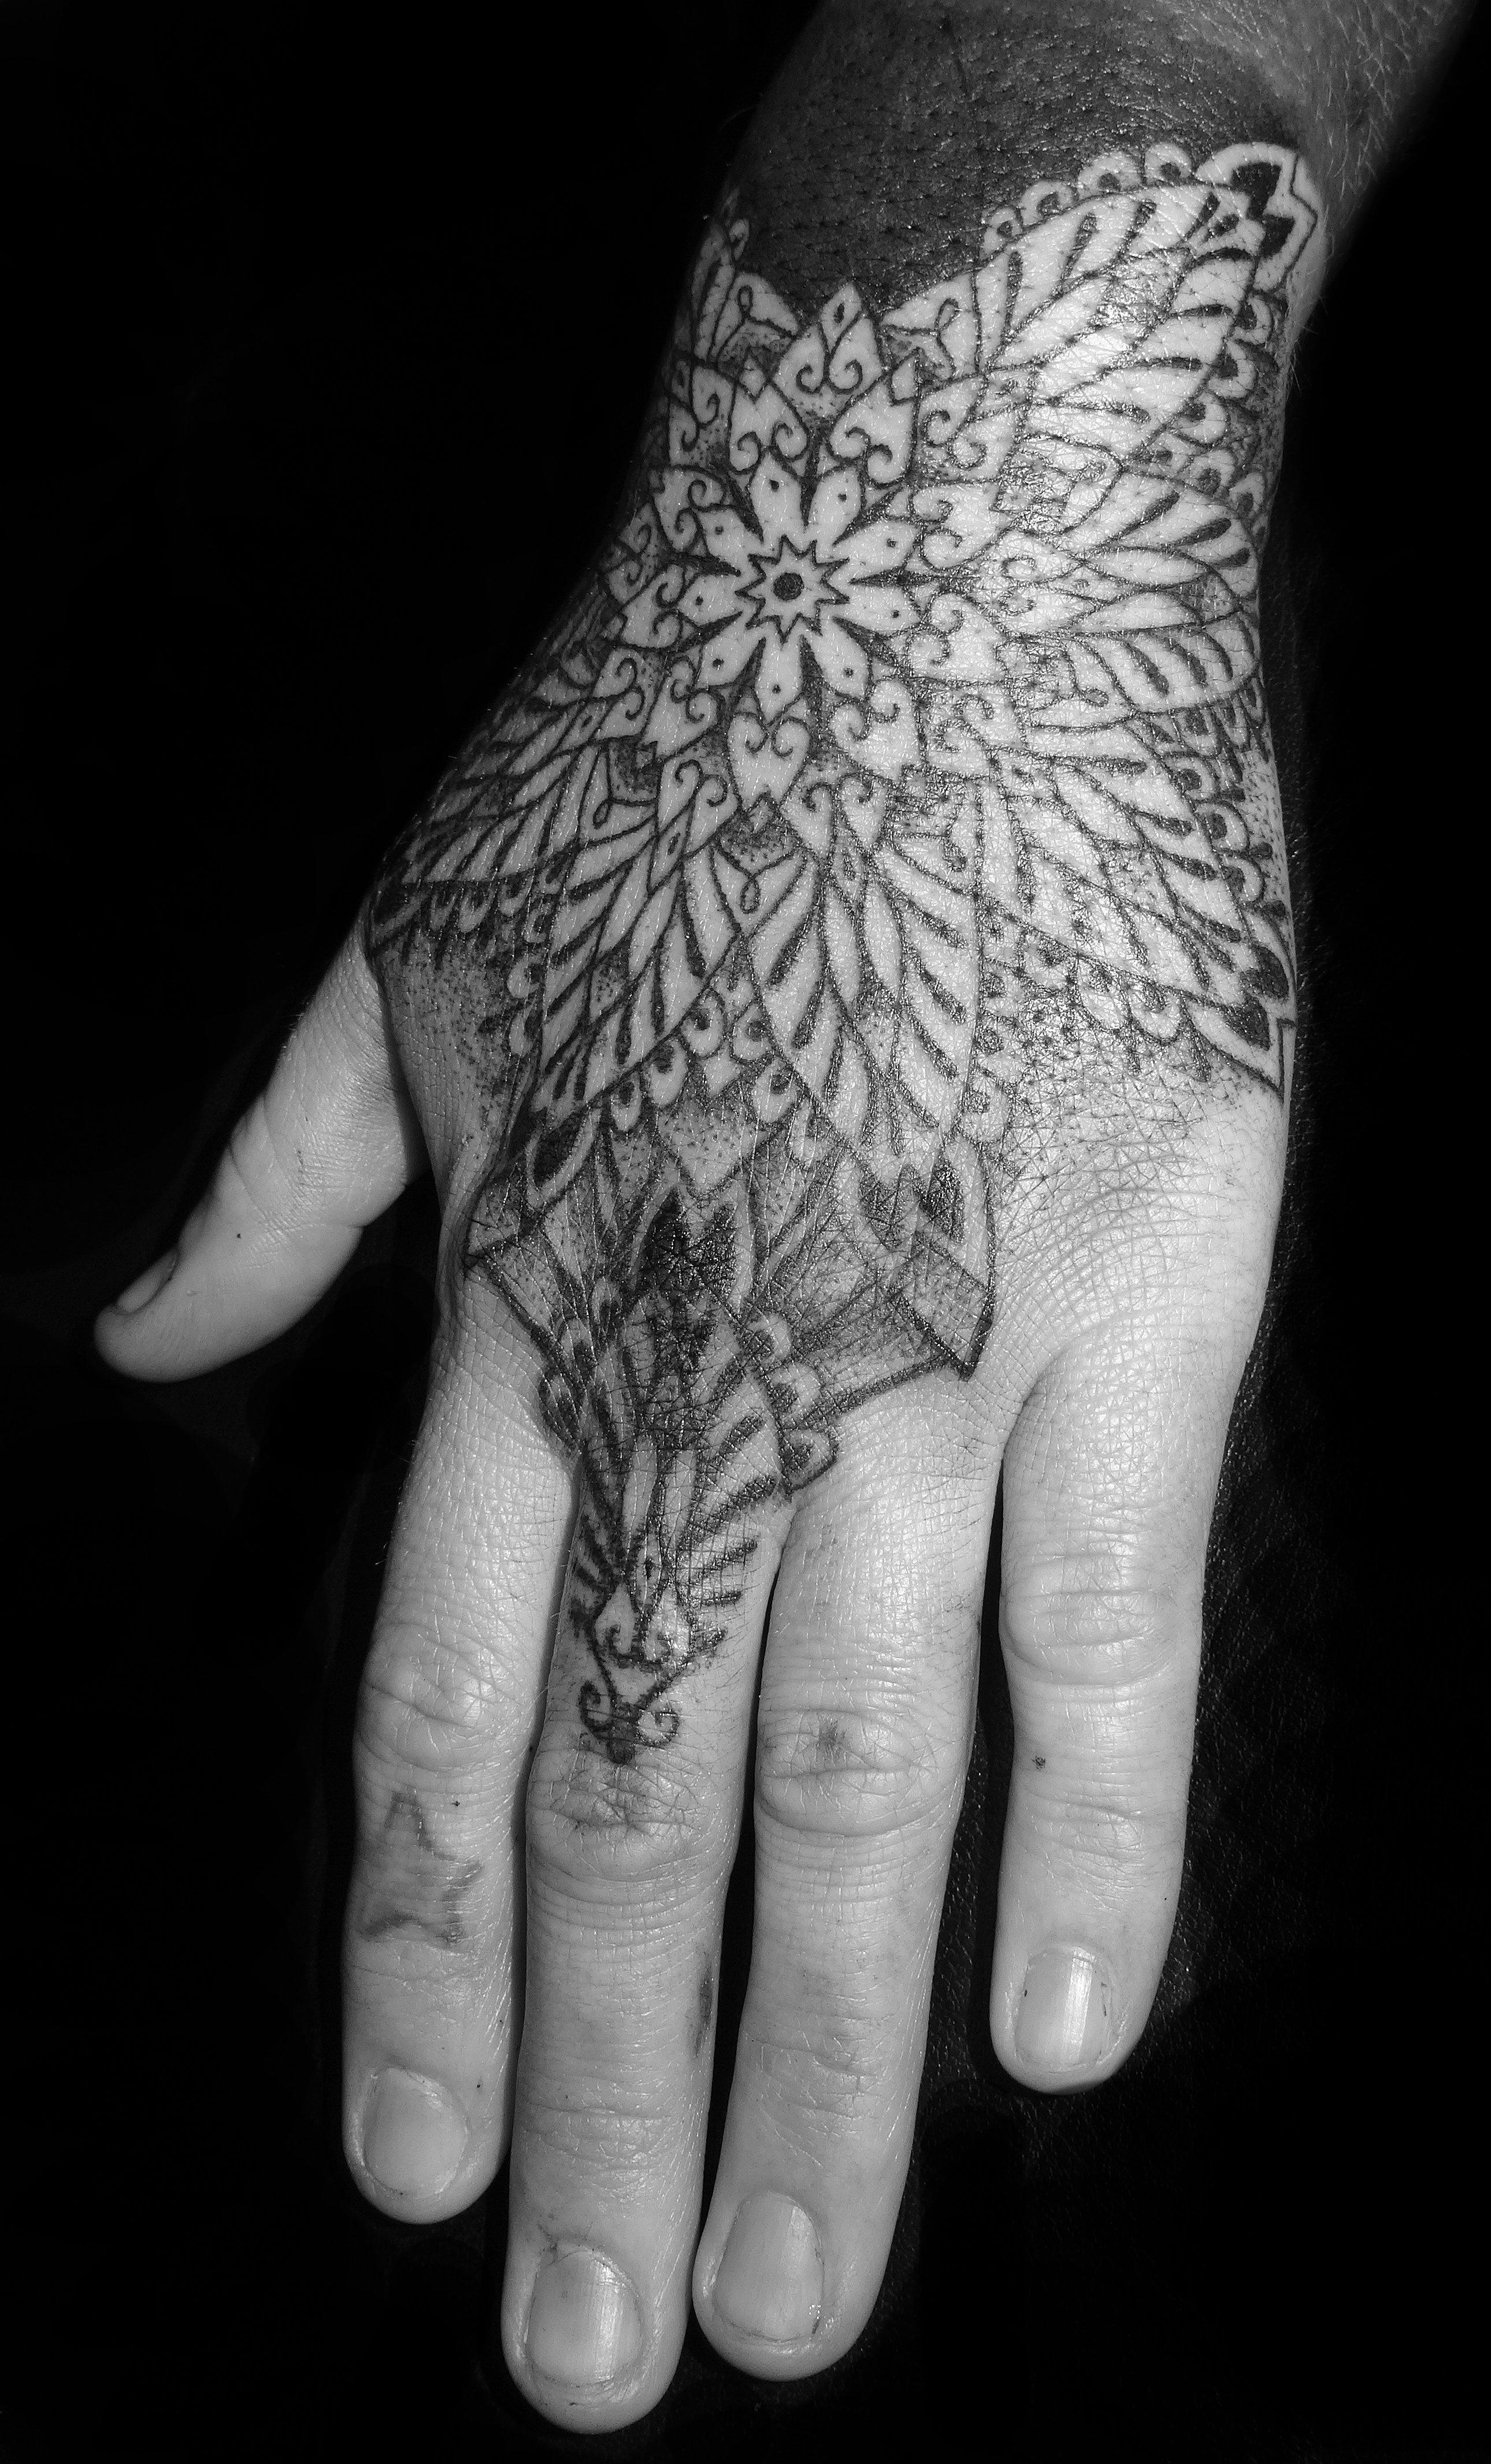 Fade fx geometric dotwork and mandala tattoo specialist for Do tattoos on hands fade